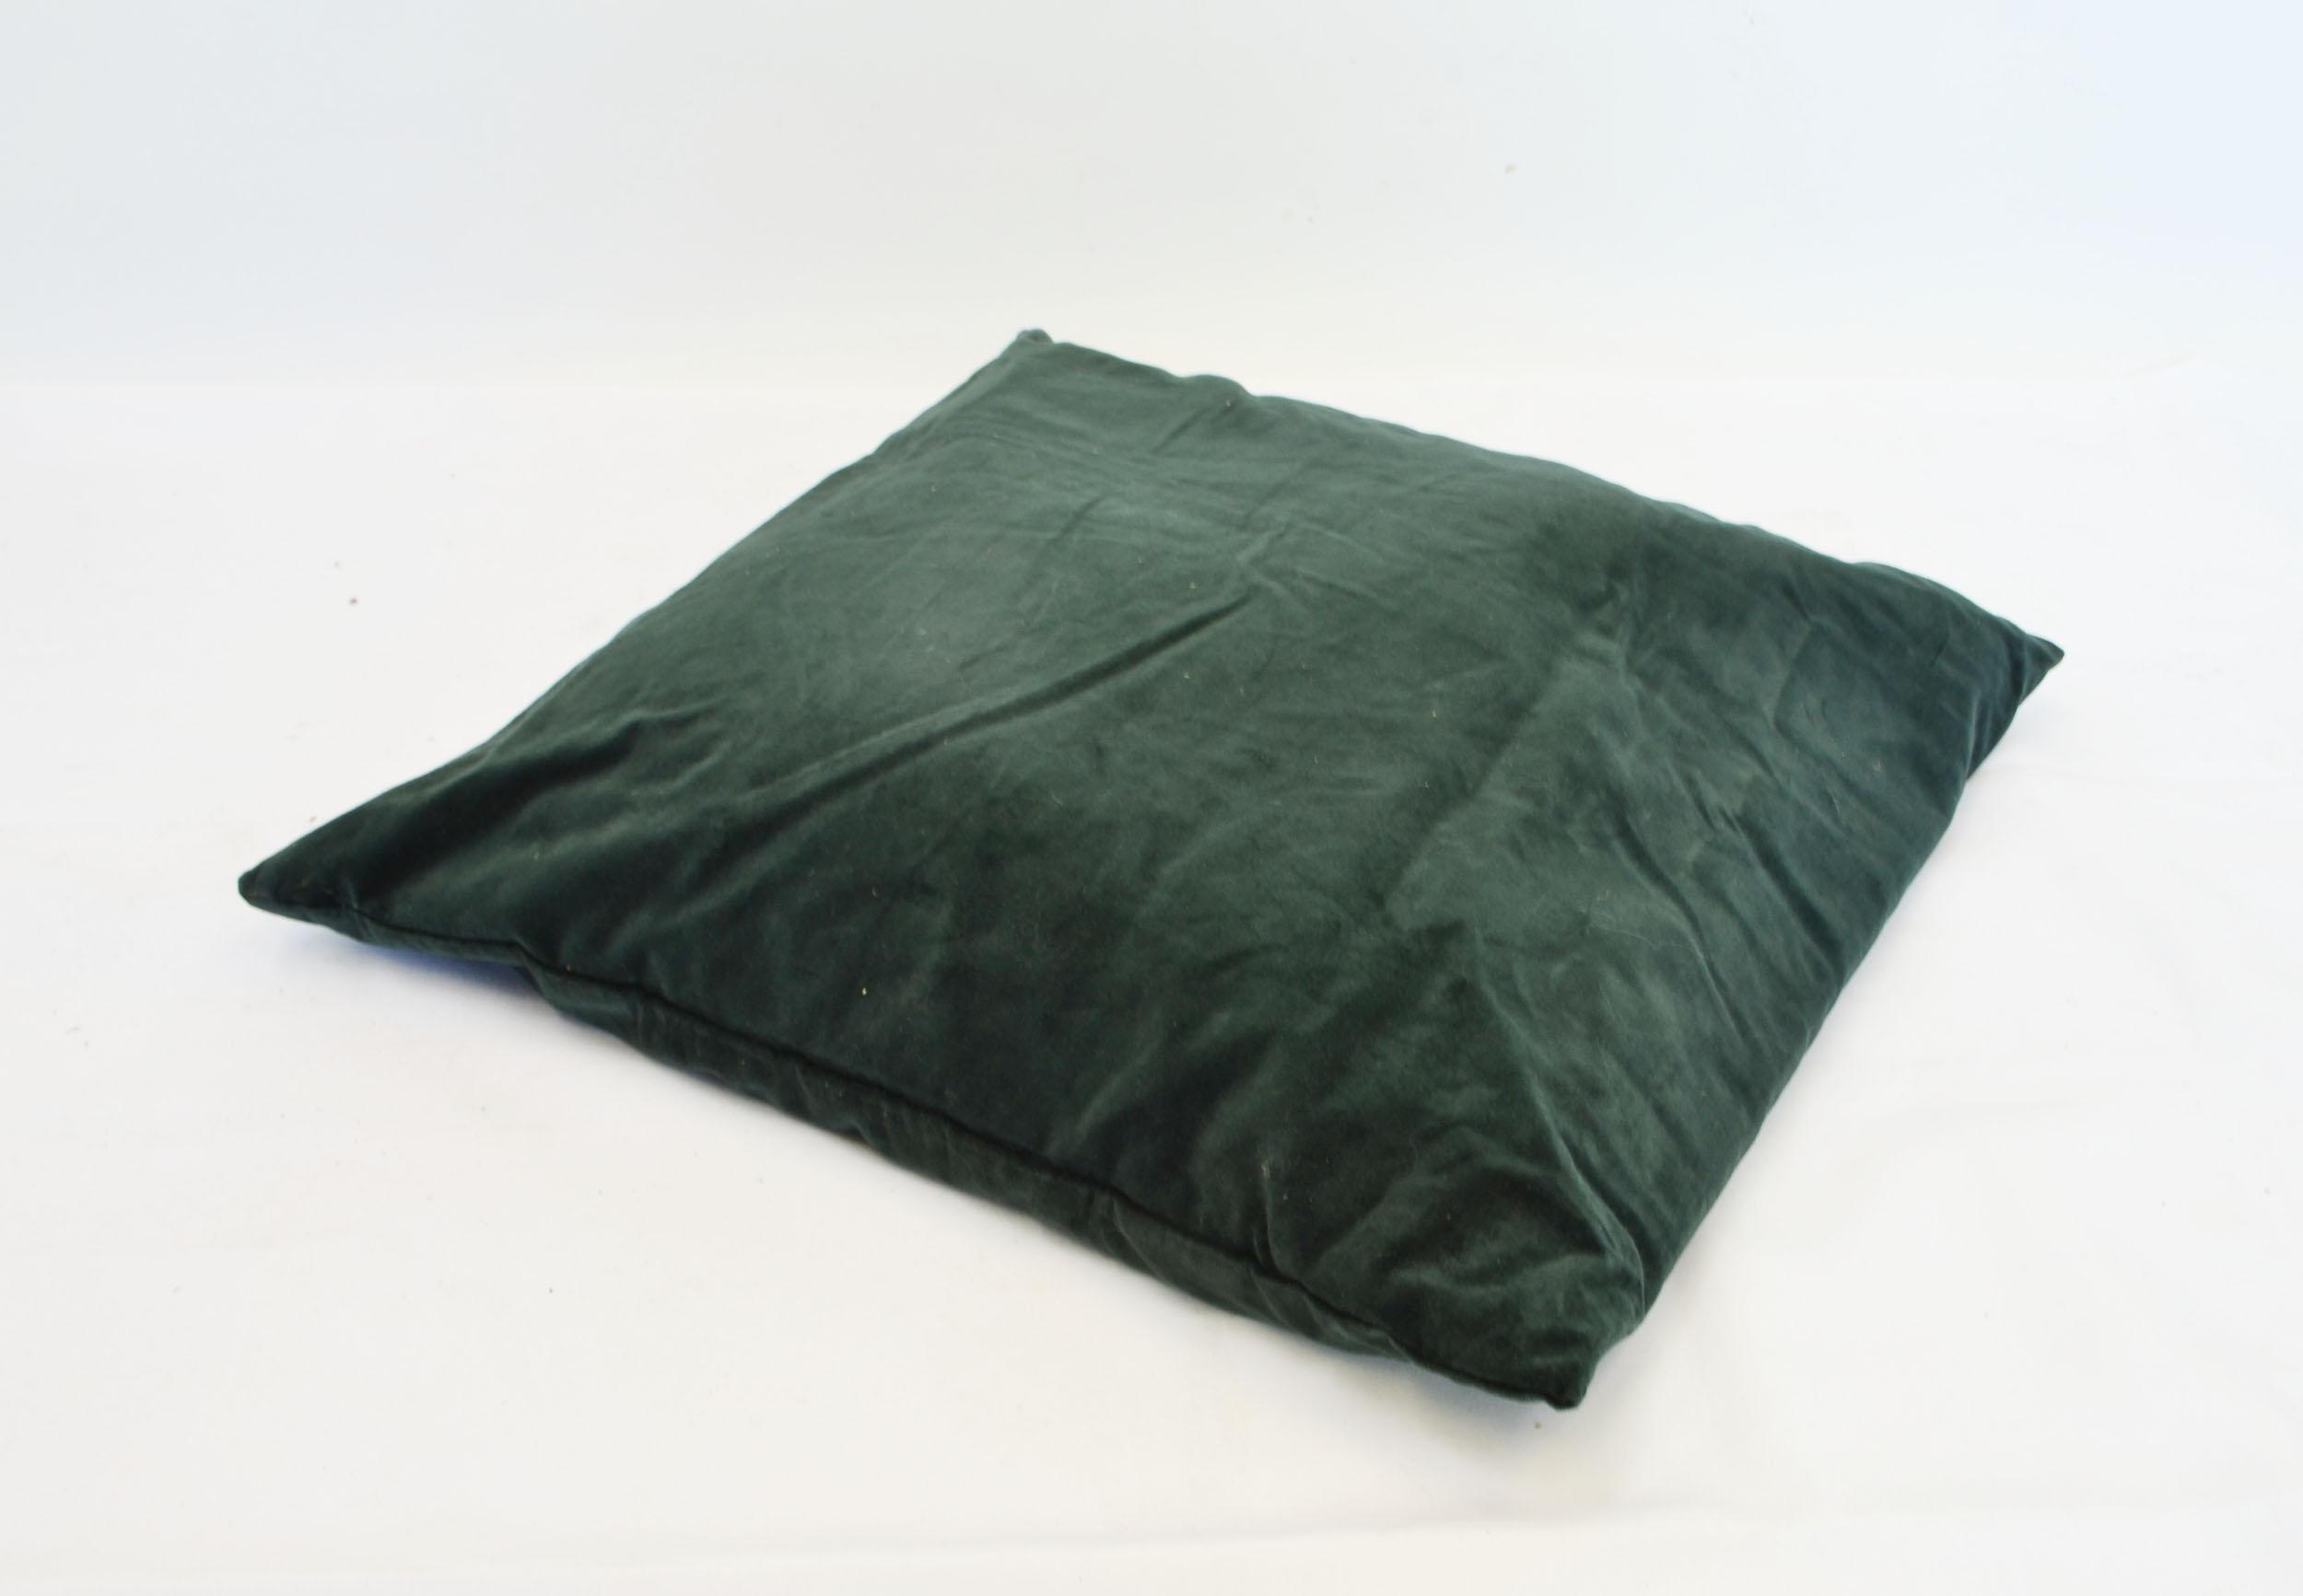 evergreen velvet pillow   Quantity: 3  Price: $10.00